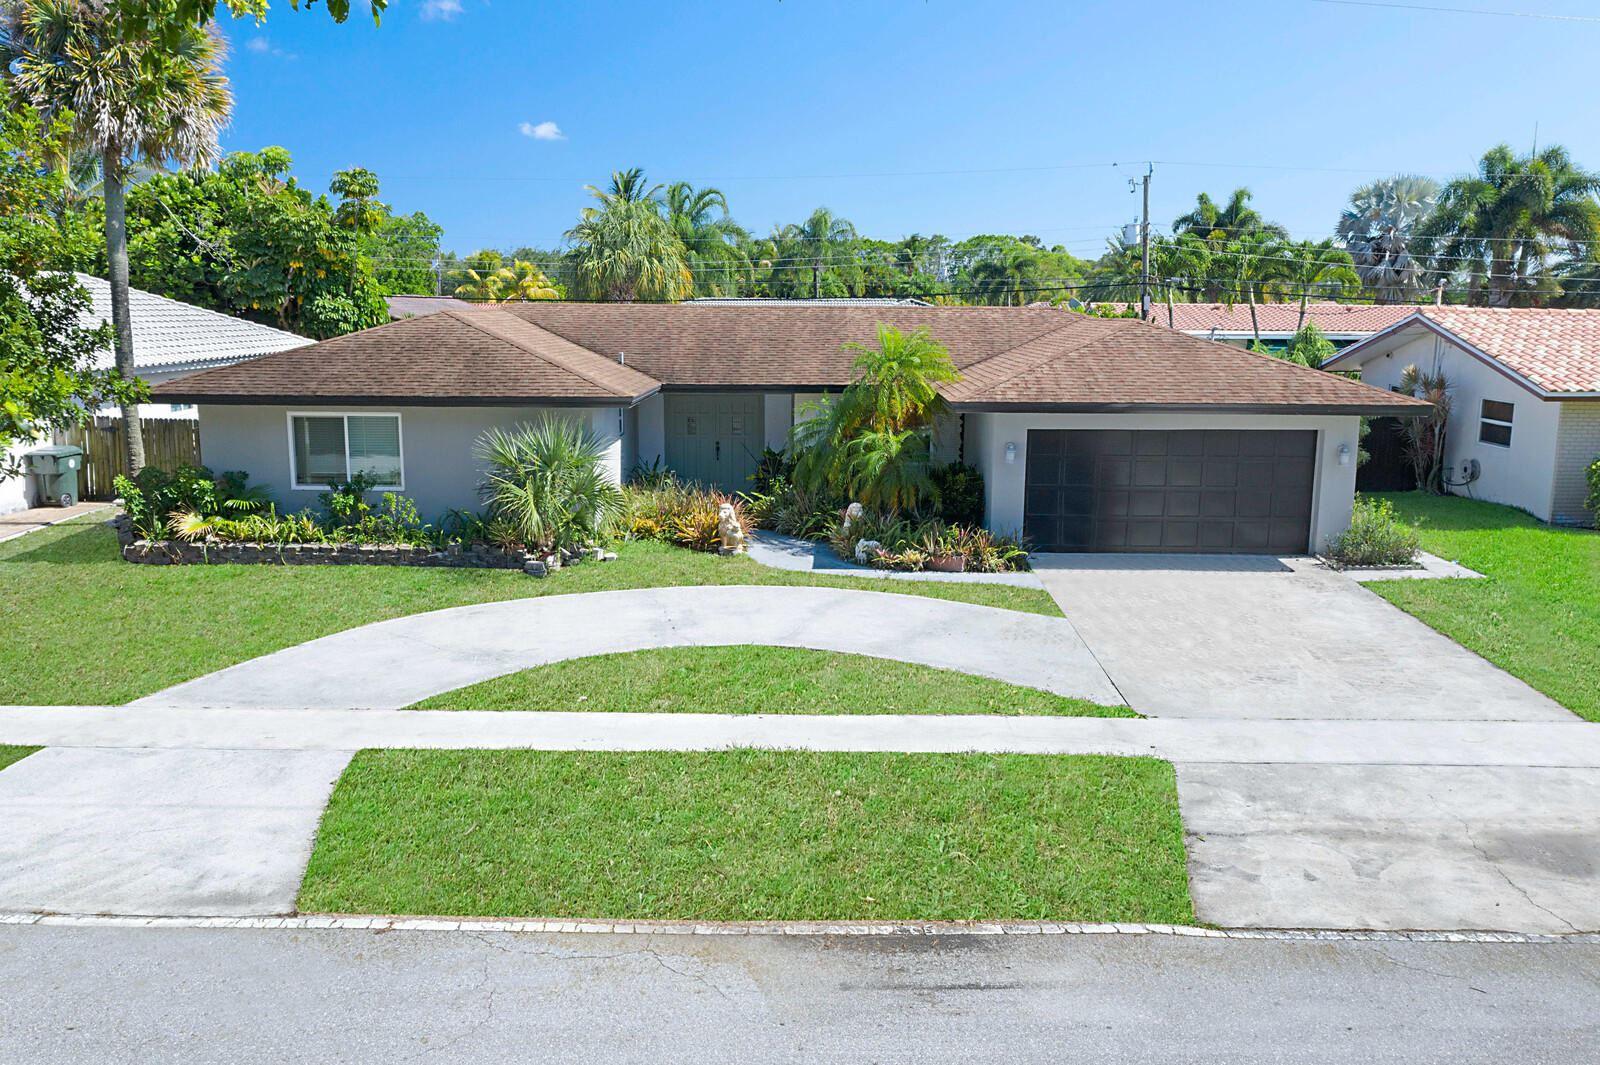 12 Burning Tree Lane, Boca Raton, FL 33431 - #: RX-10714101